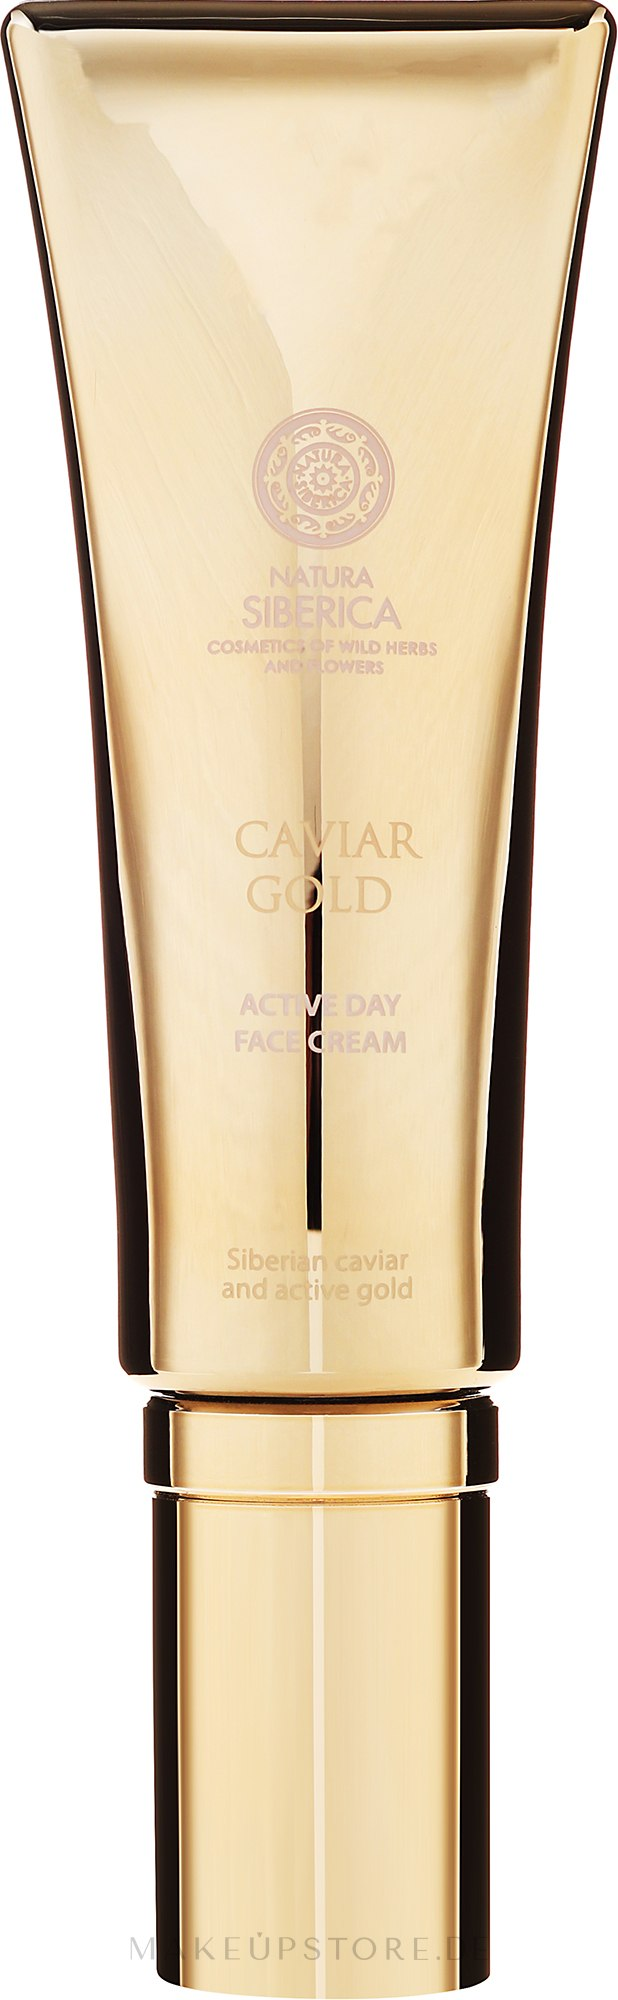 "Aktiv-Tagescreme ""Frische-Booster"" - Natura Siberica Caviar Gold — Bild 30 ml"